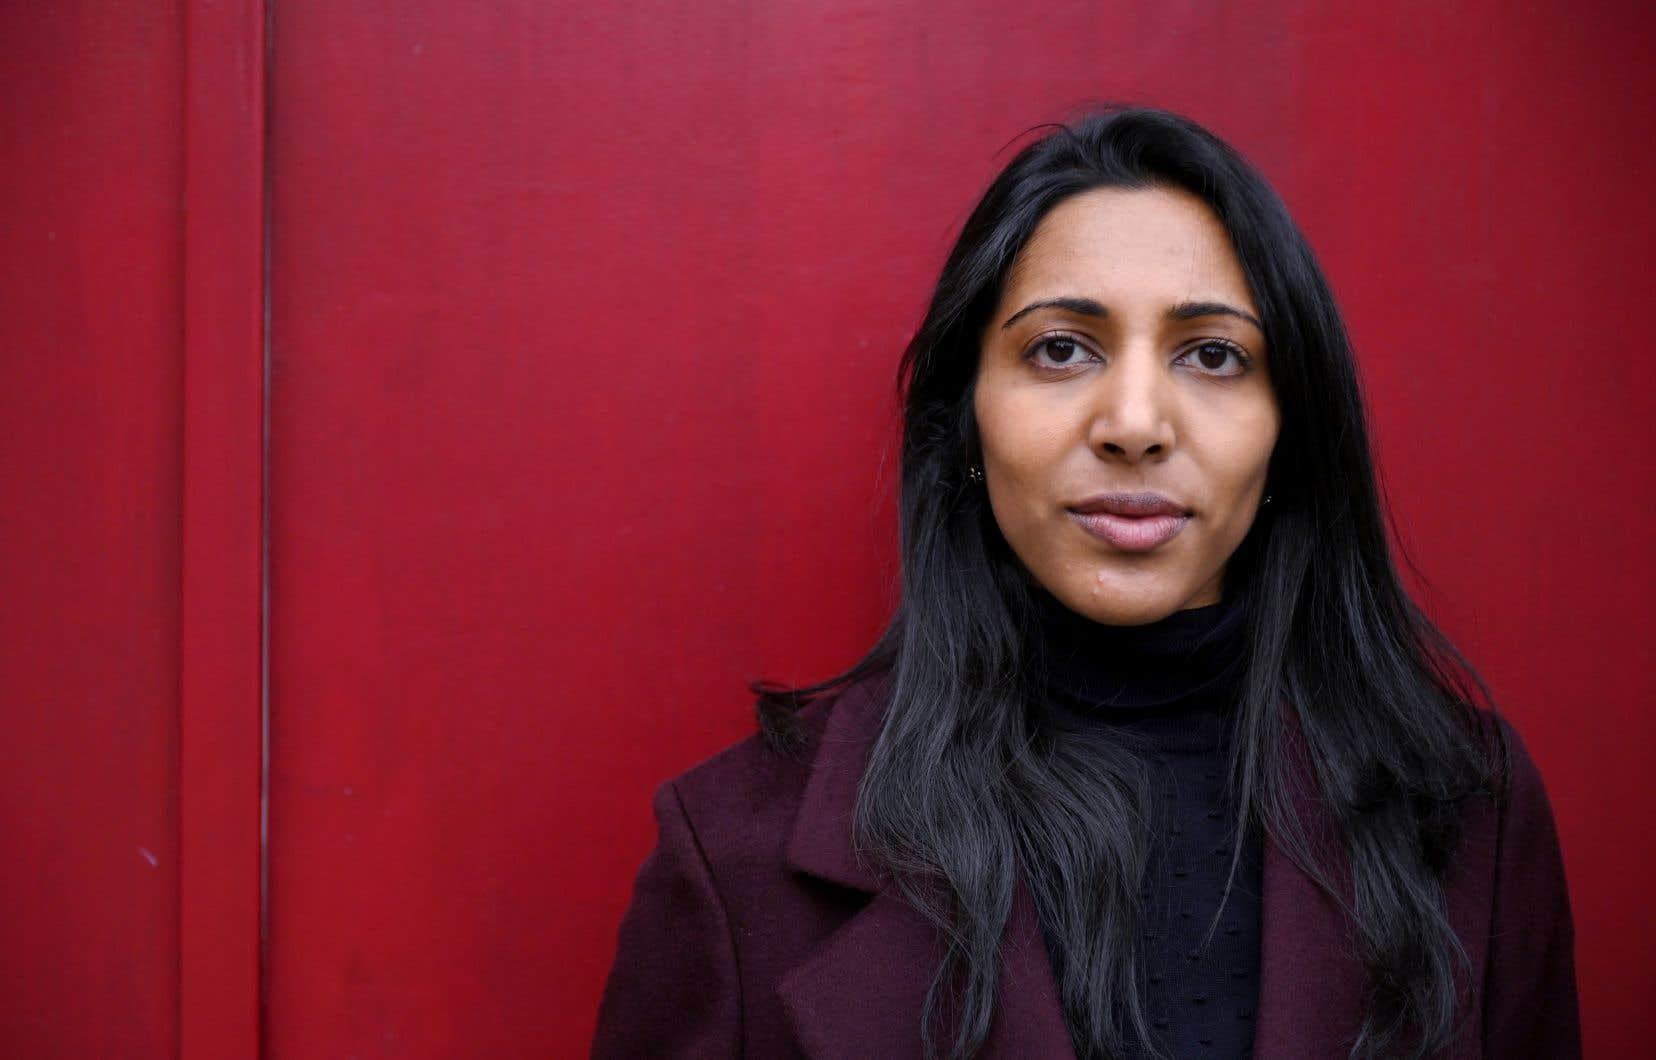 La fondatrice de la start-up Moonshot CVE, Vidhya Ramalingam